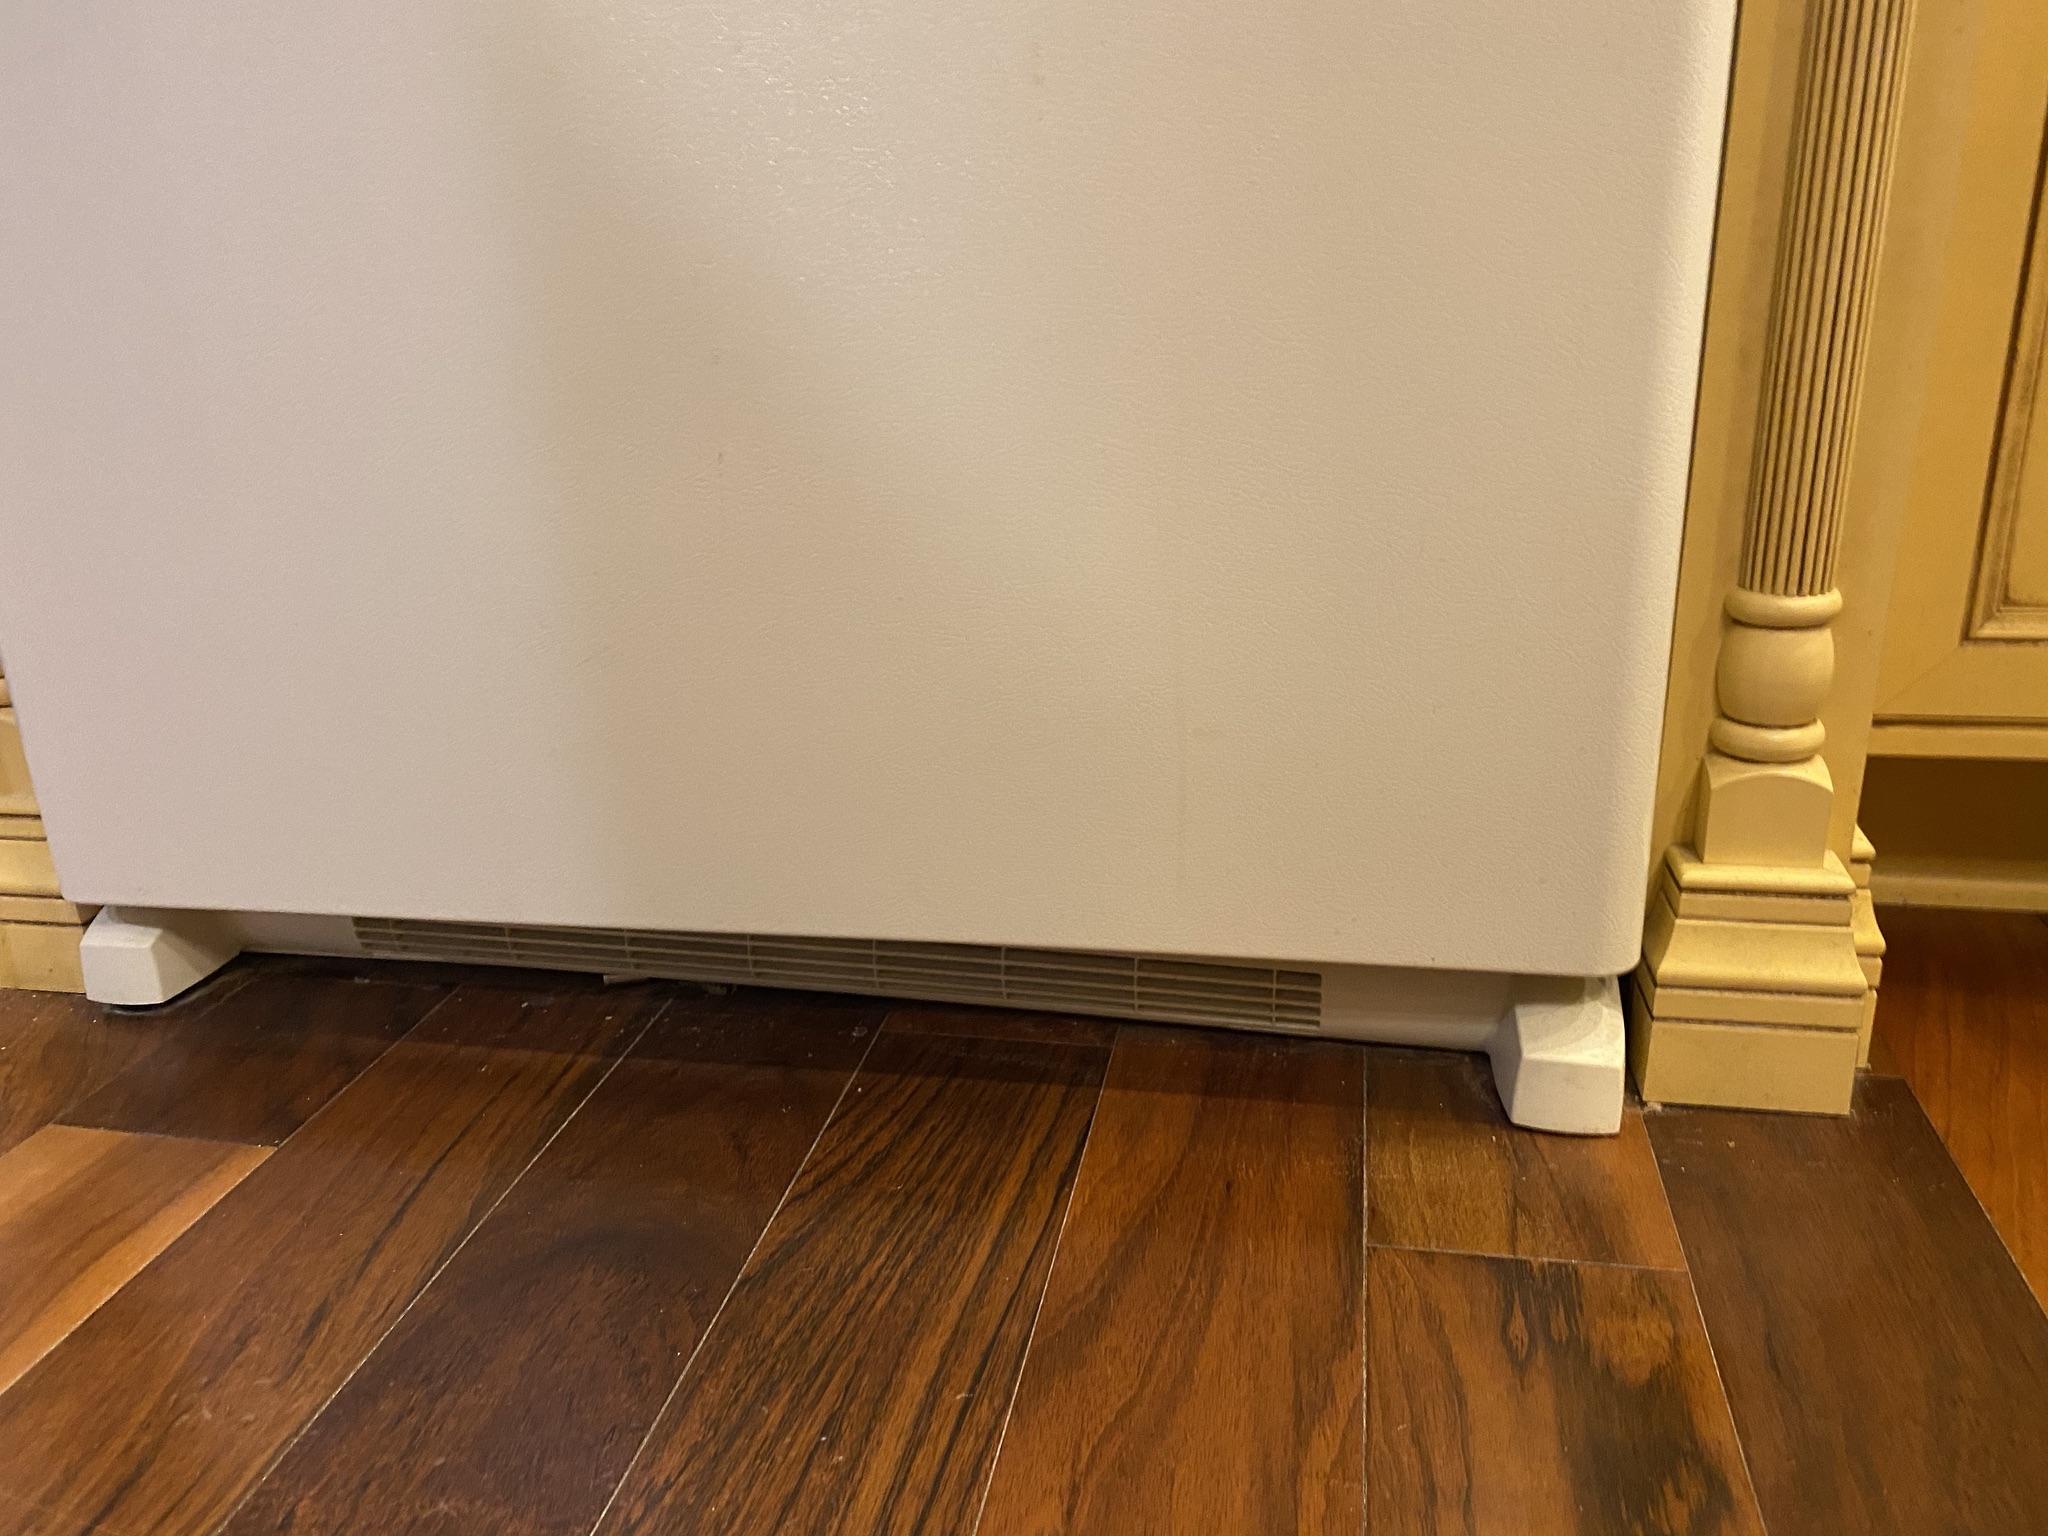 Modifying custom cabinetry-img_7.jpg